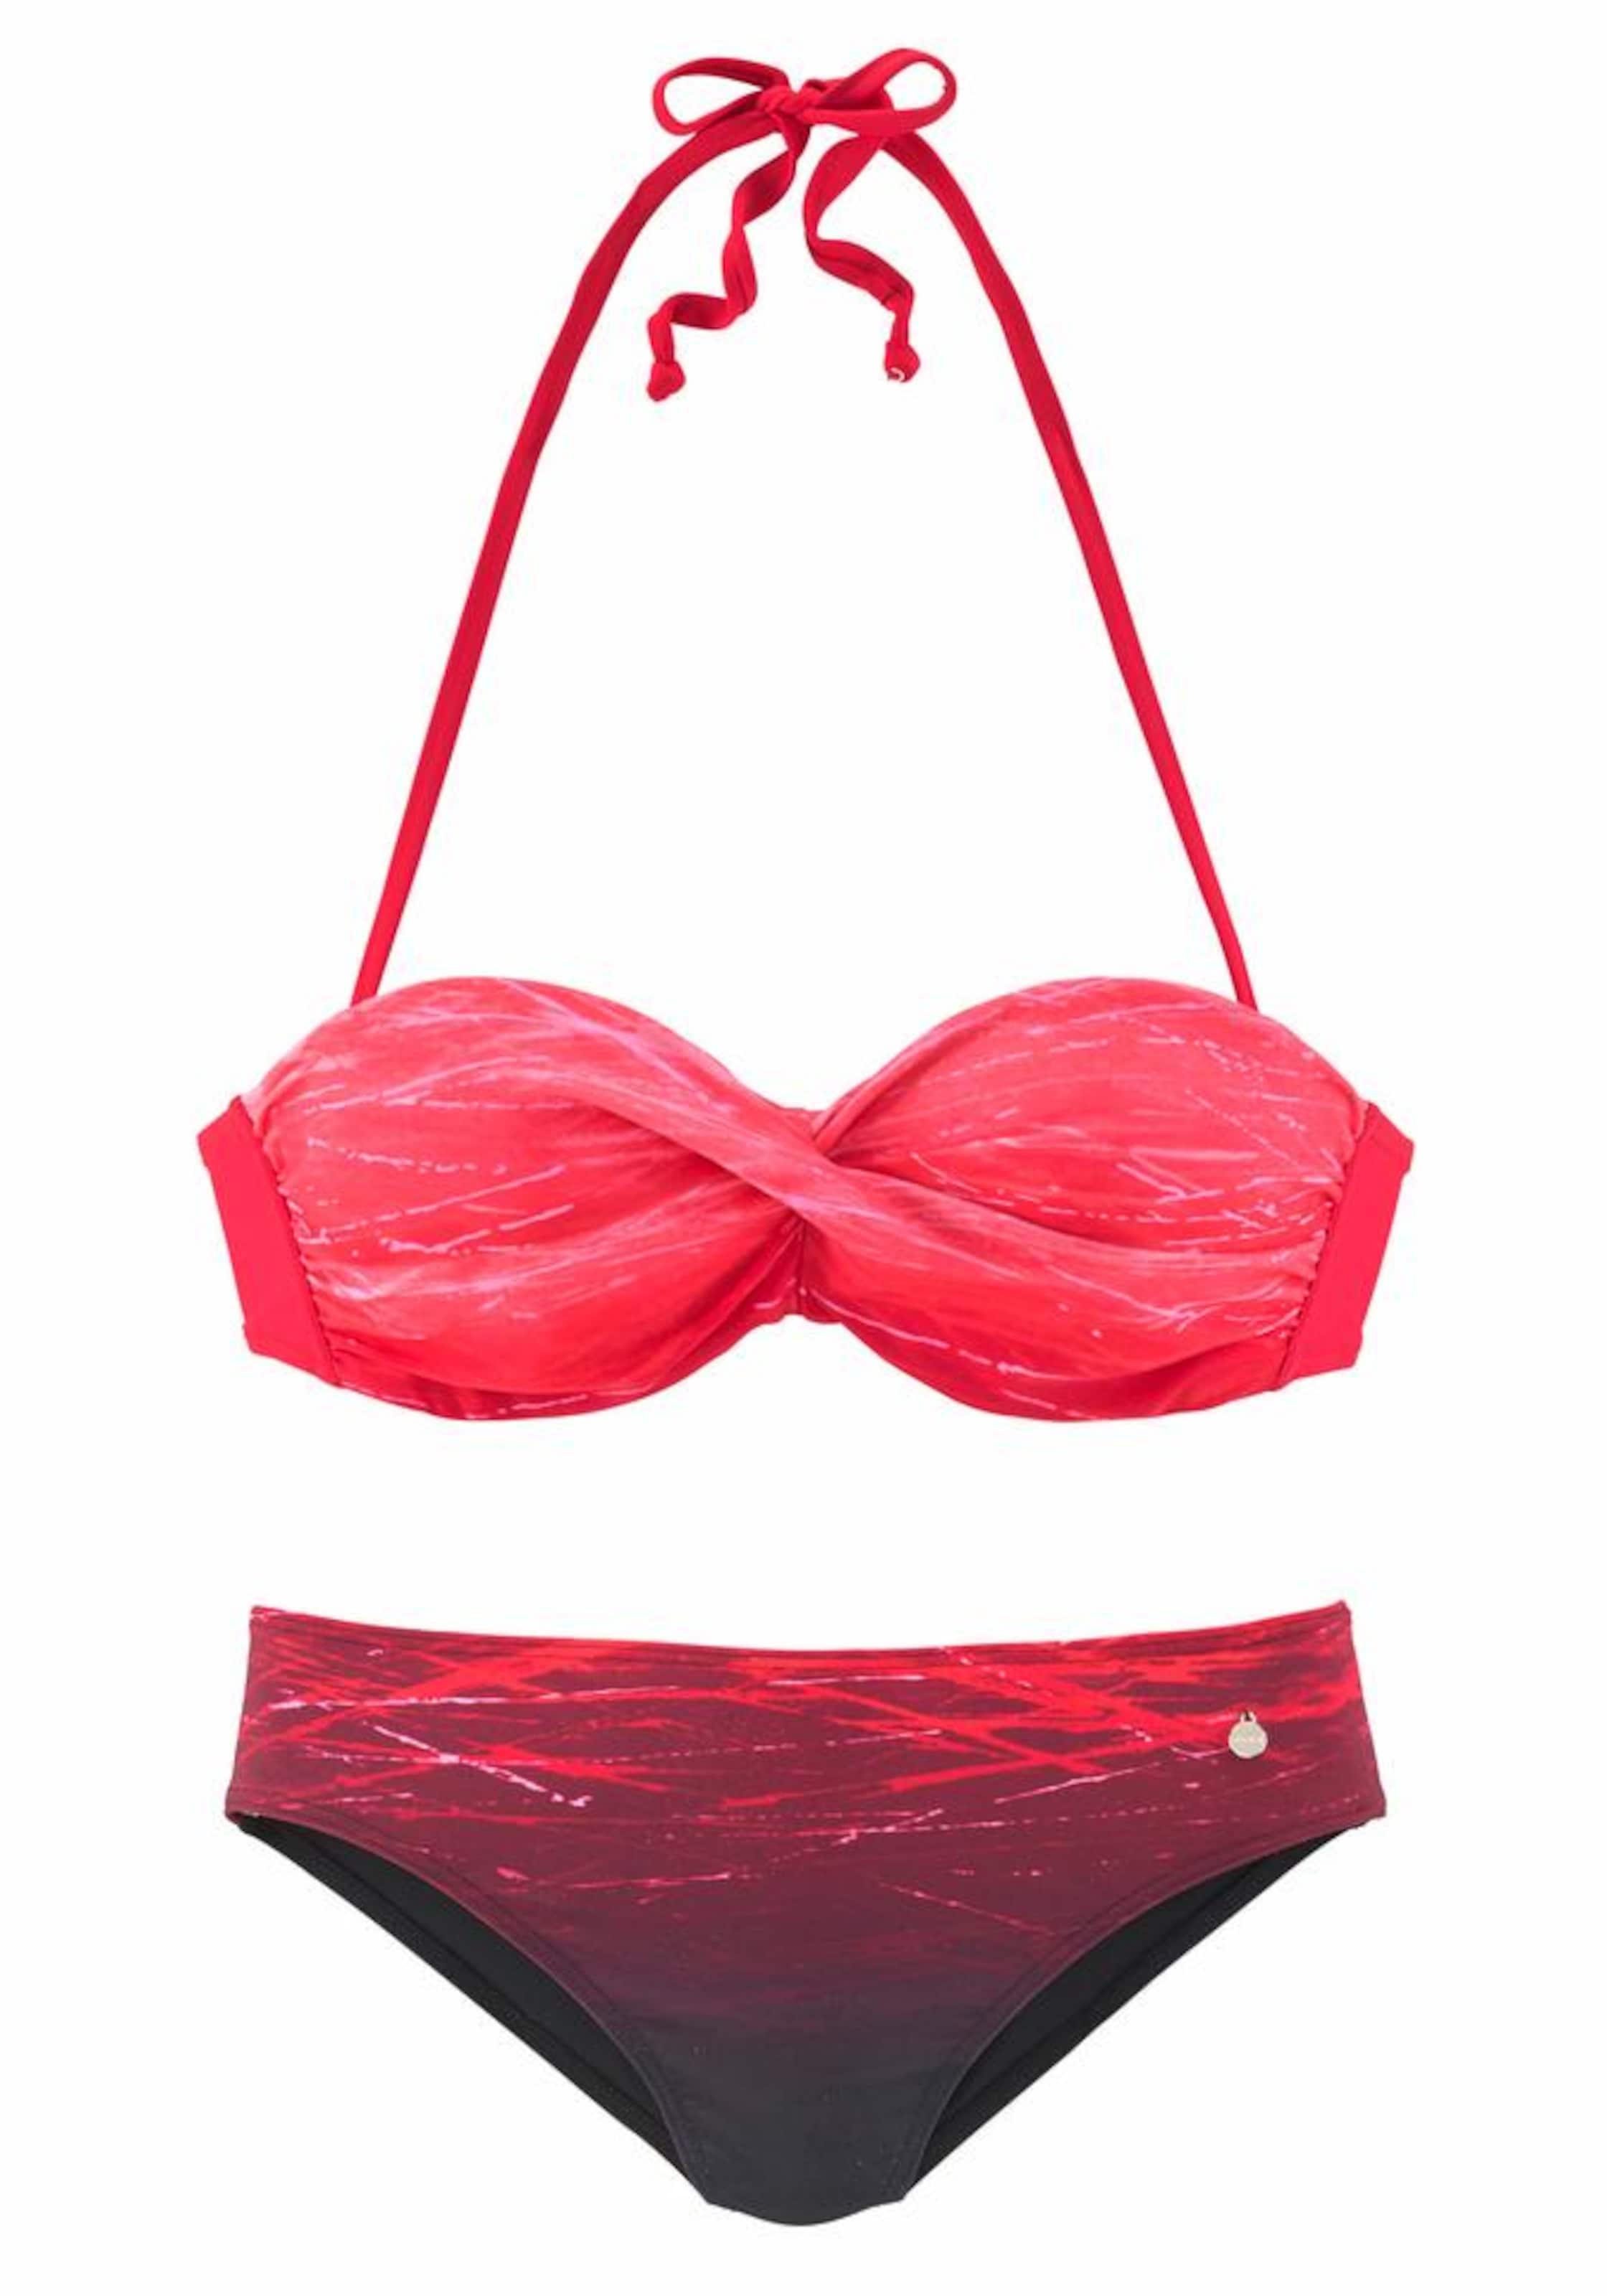 LASCANA Bügel-Bandeau-Bikini Billig Billig RkpQ5